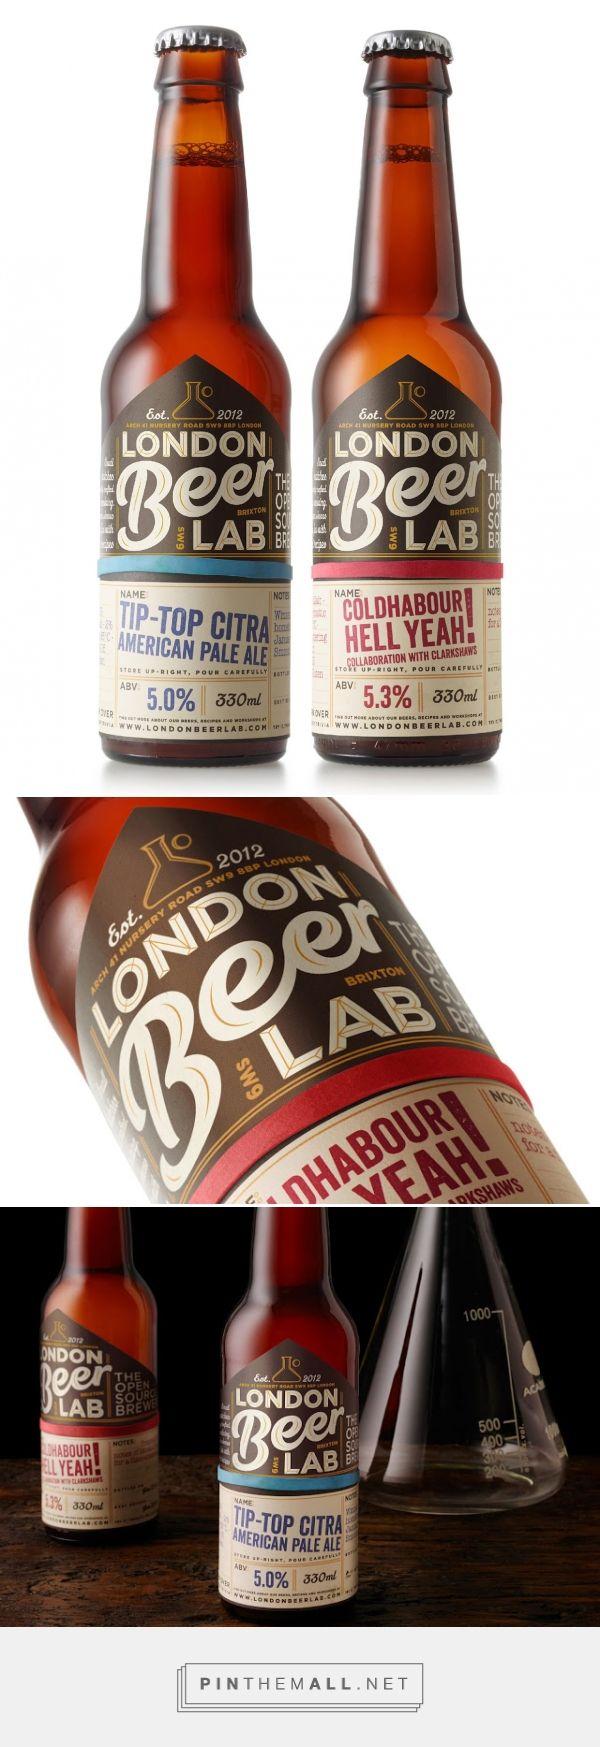 London Beer Lab packaging label designed by Elmwood Brand Design (UK) - http://www.packagingoftheworld.com/2016/01/london-beer-lab.html